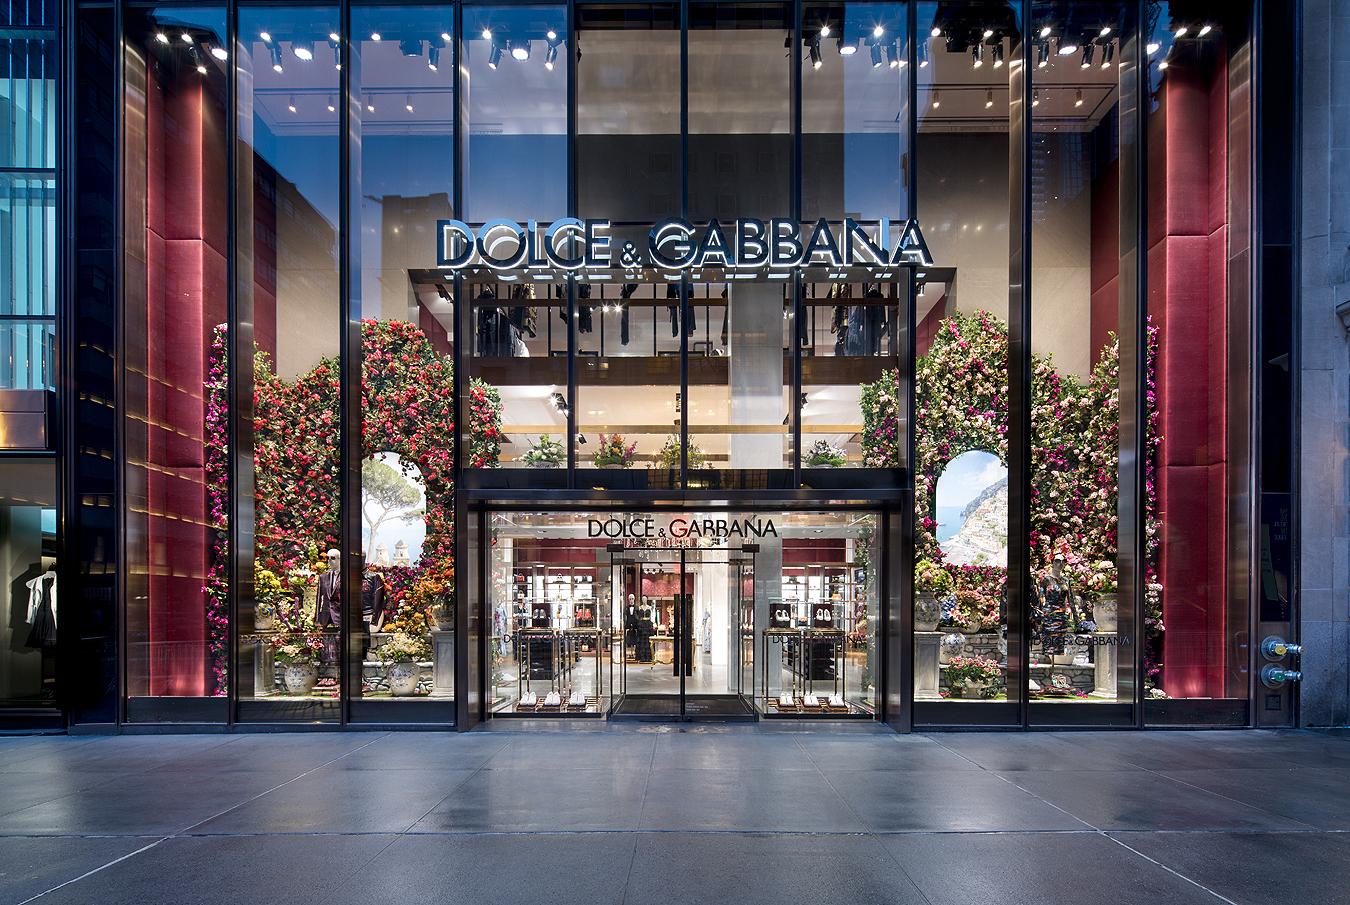 Tony_Ward_Studio_Dolce_Gabbana_store_NYC_Photo_Luca_ Pioltelli_copyright_2018_picture